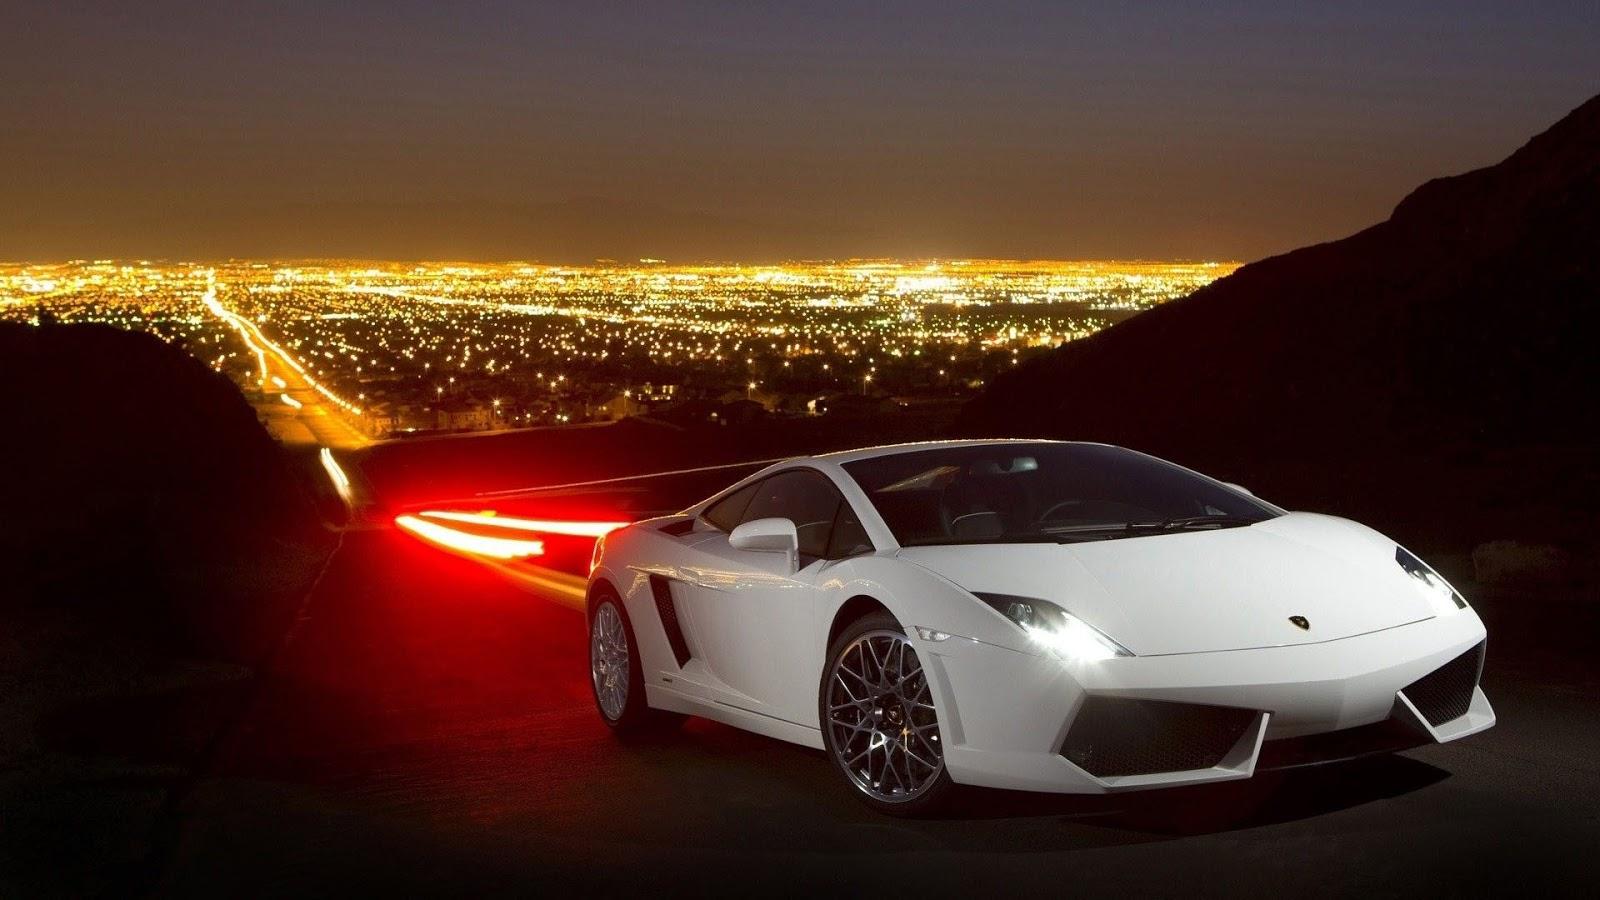 HD Stylish Cars Wallpapers,